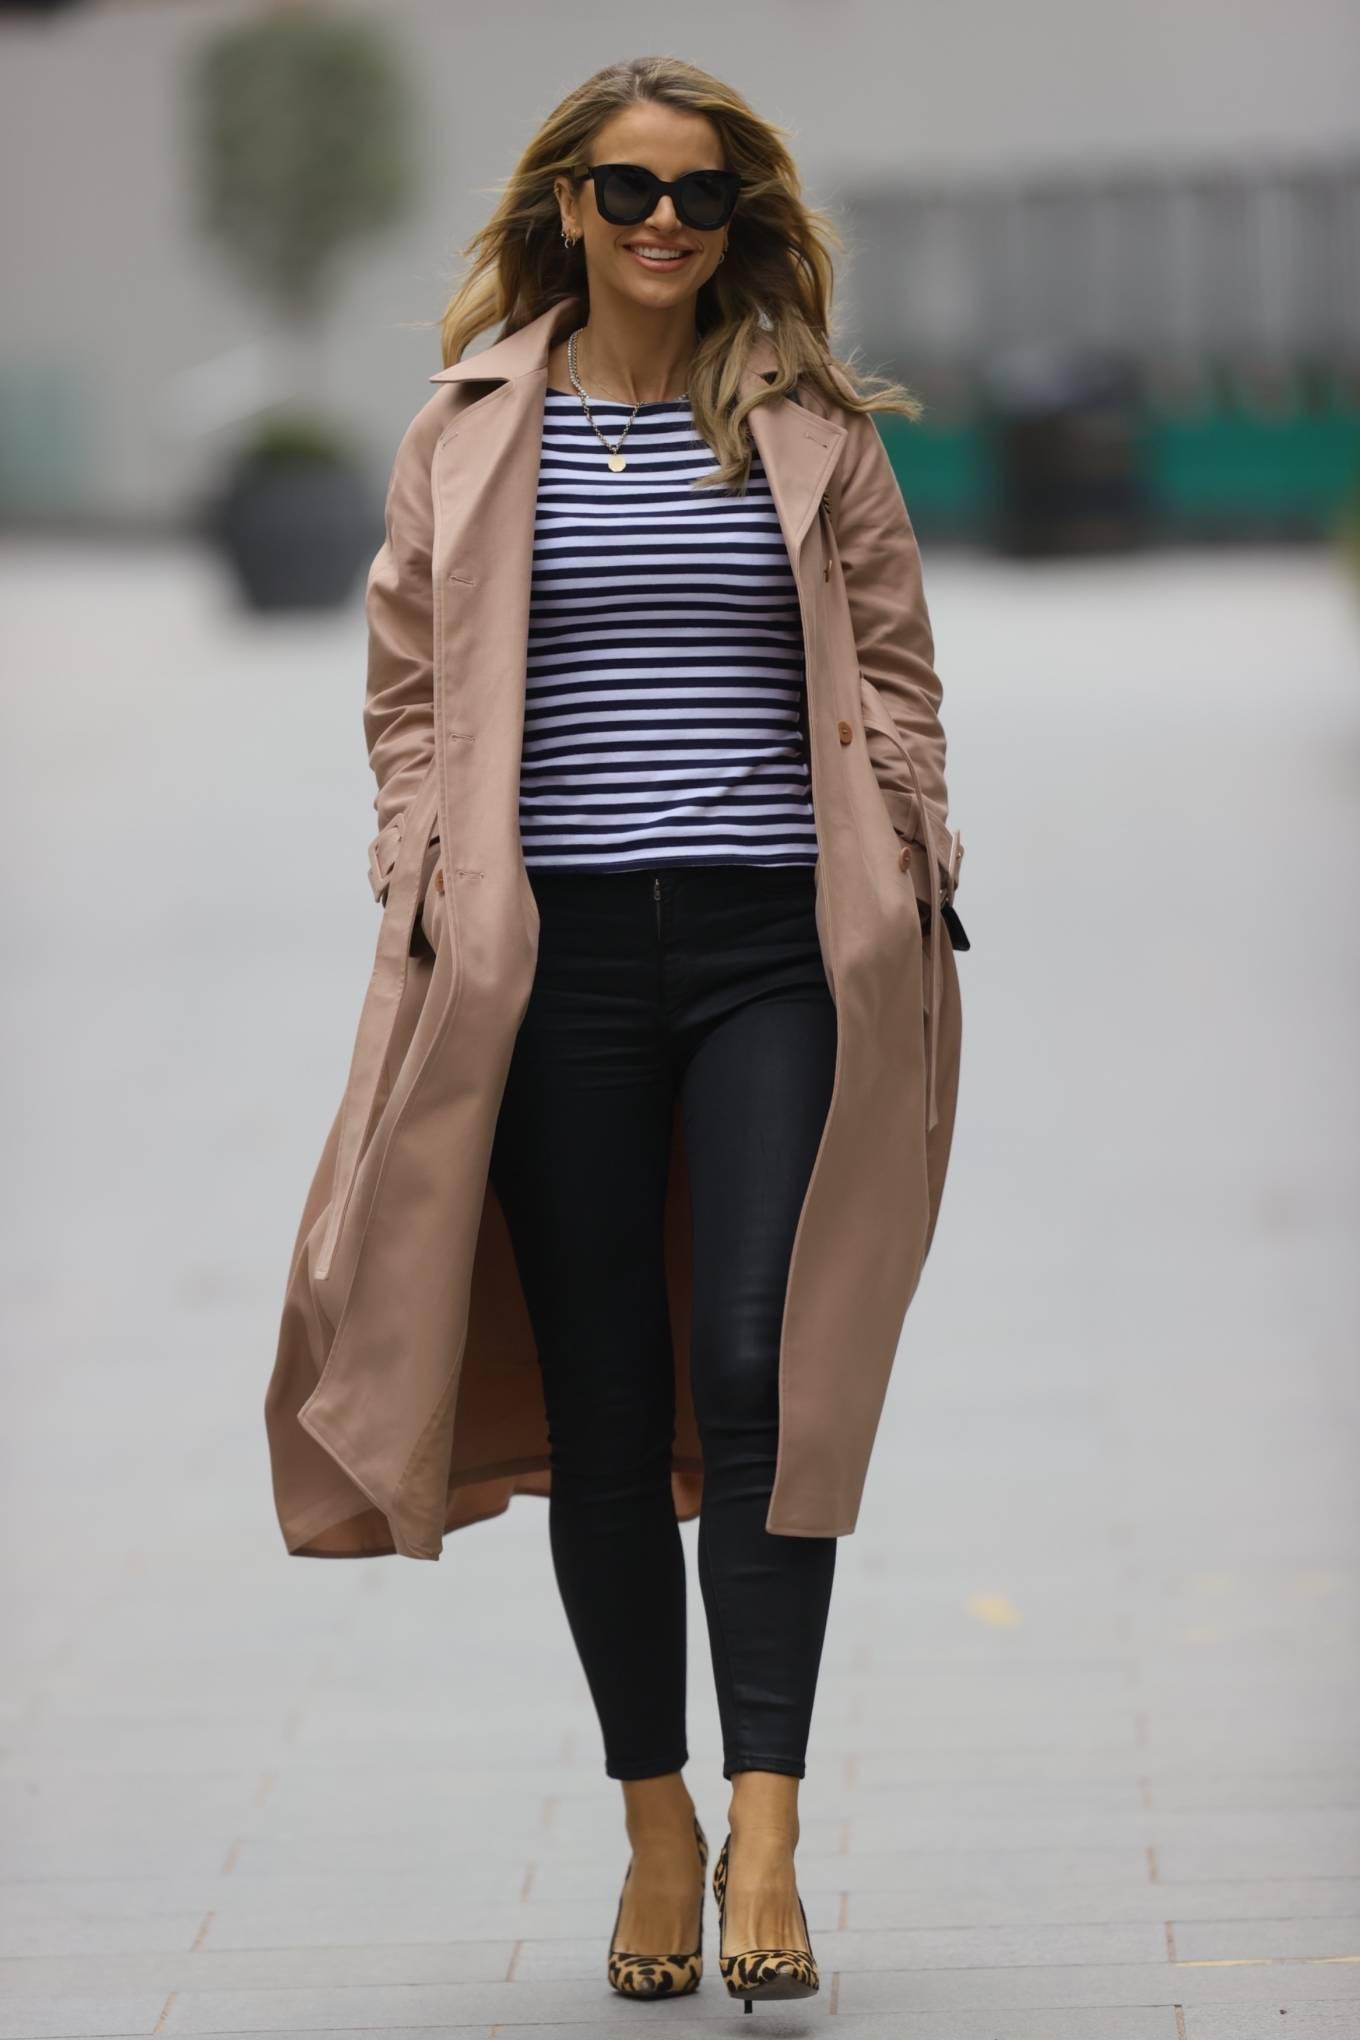 Vogue Williams - In leggings and animal print heals in London